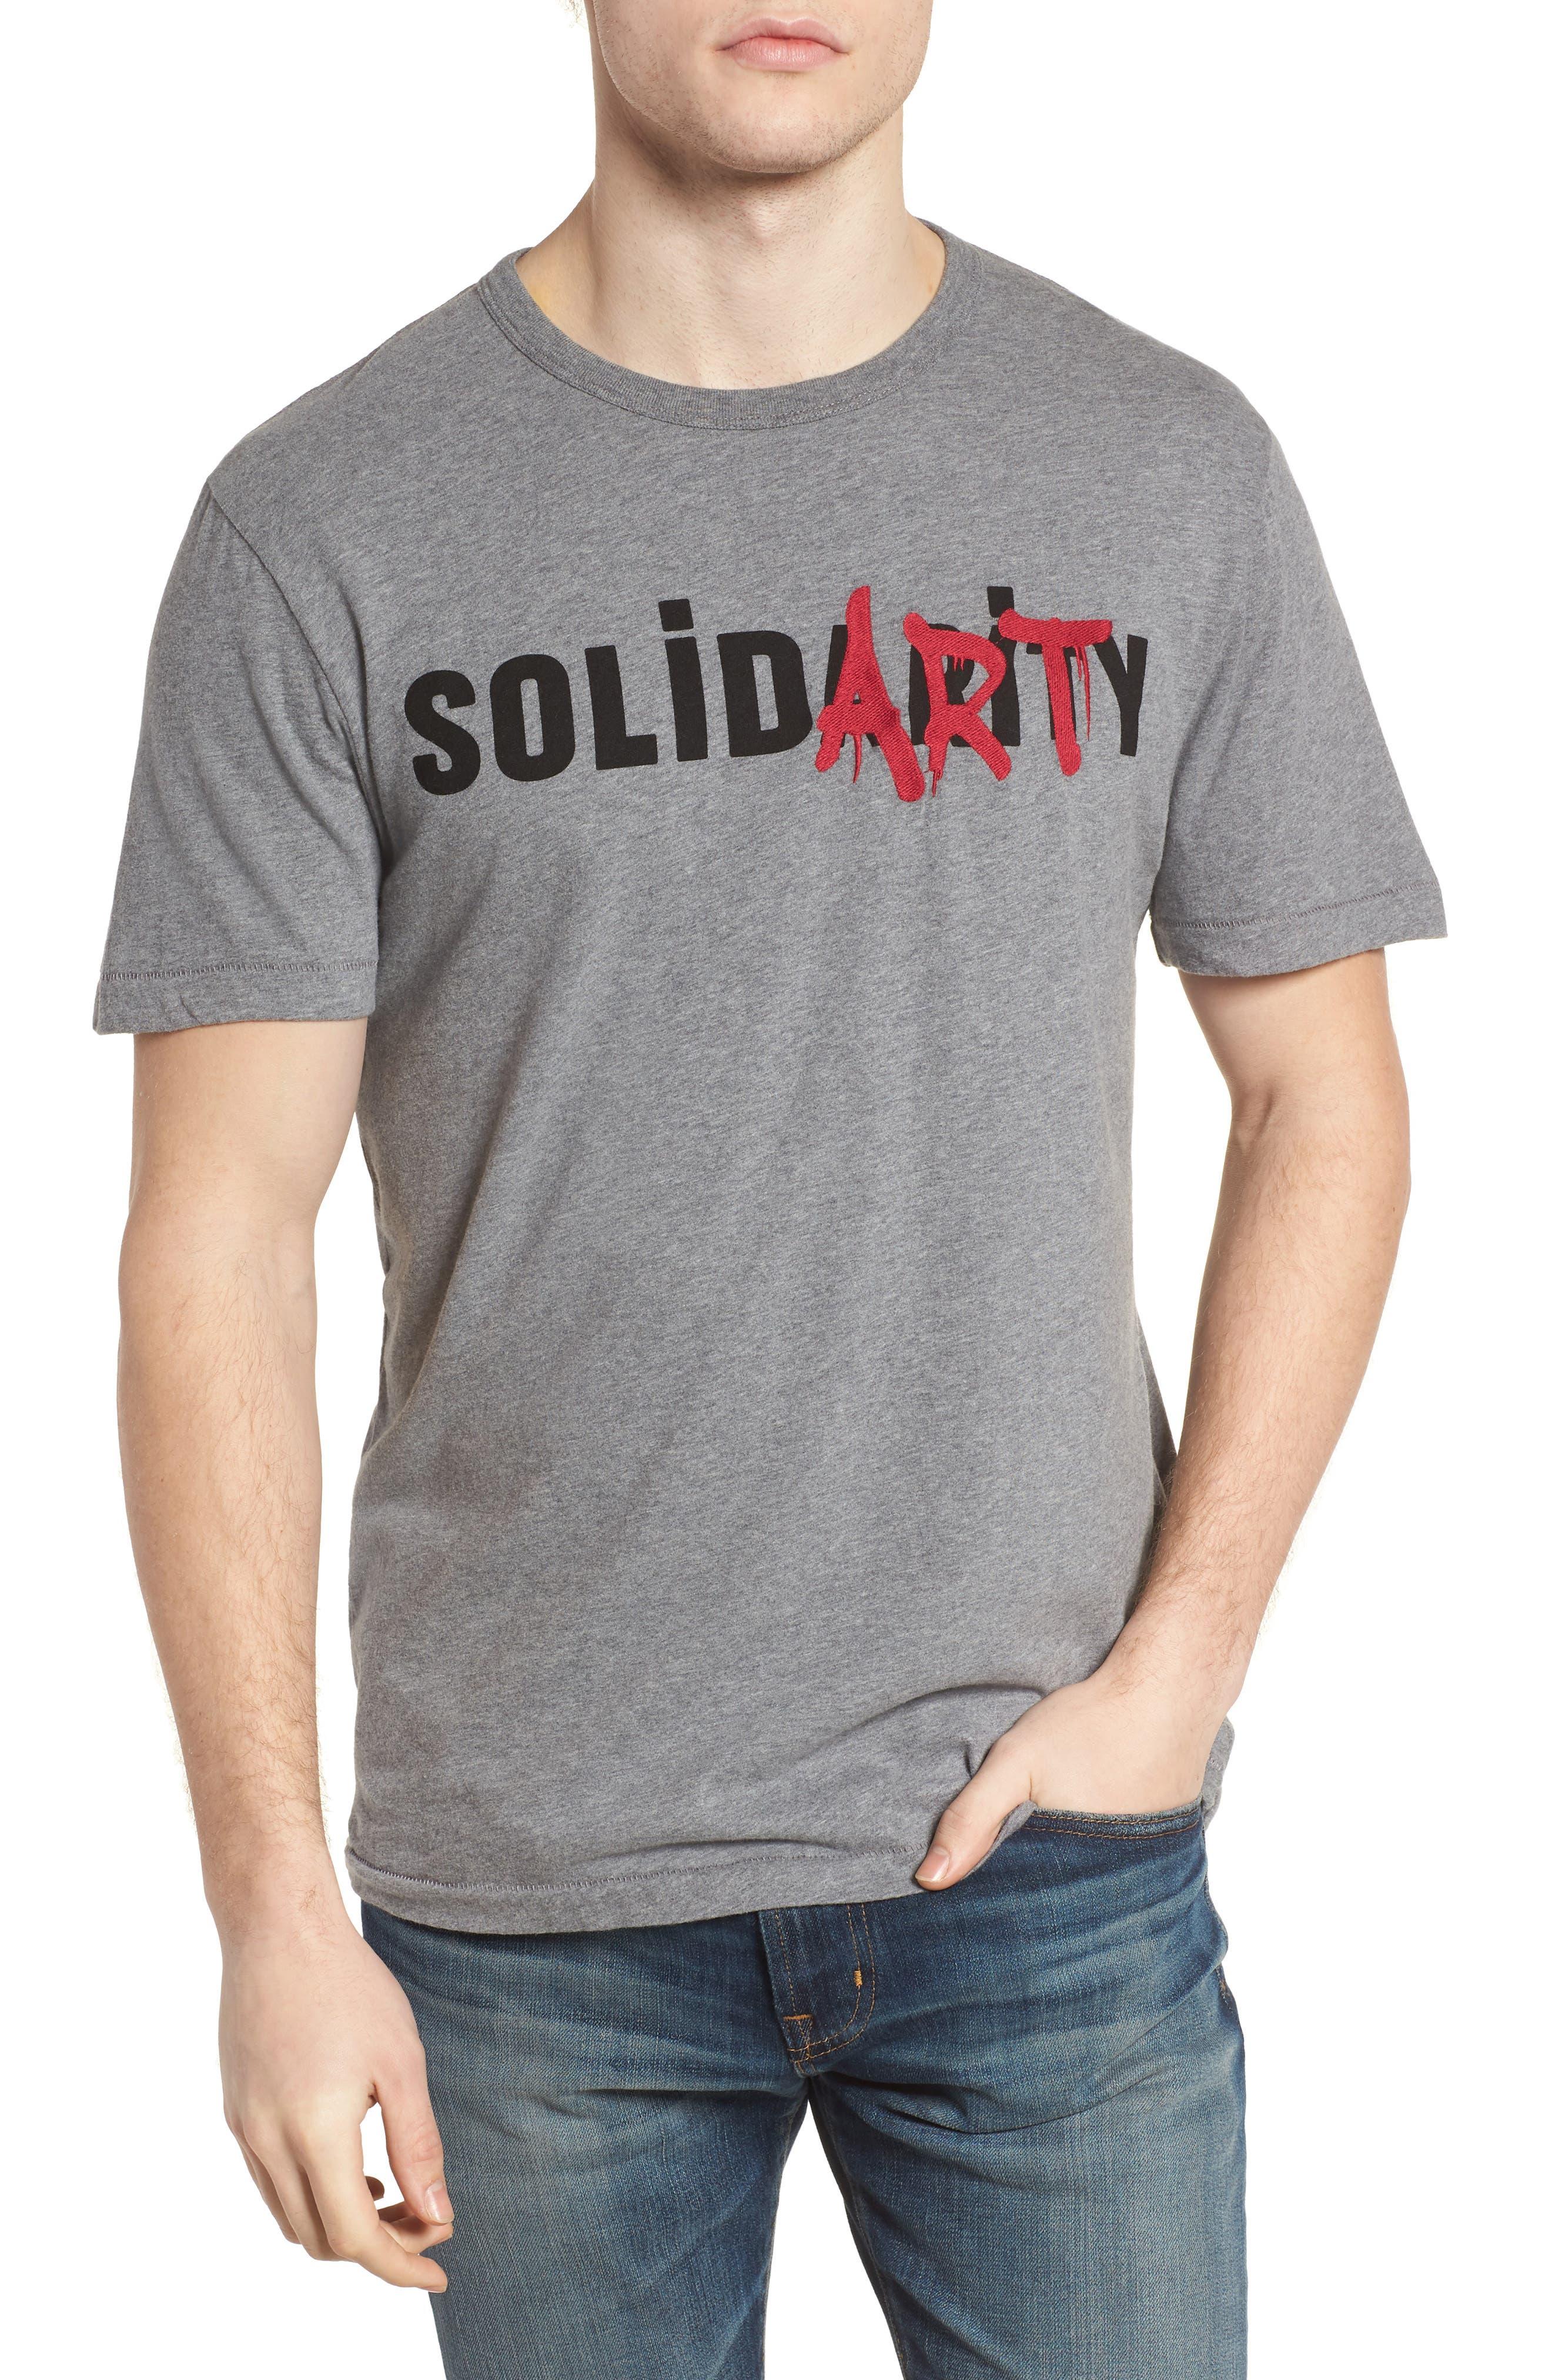 Solidarity Slim Fit Crewneck T-Shirt,                         Main,                         color, Mid Grey Melange/ Black